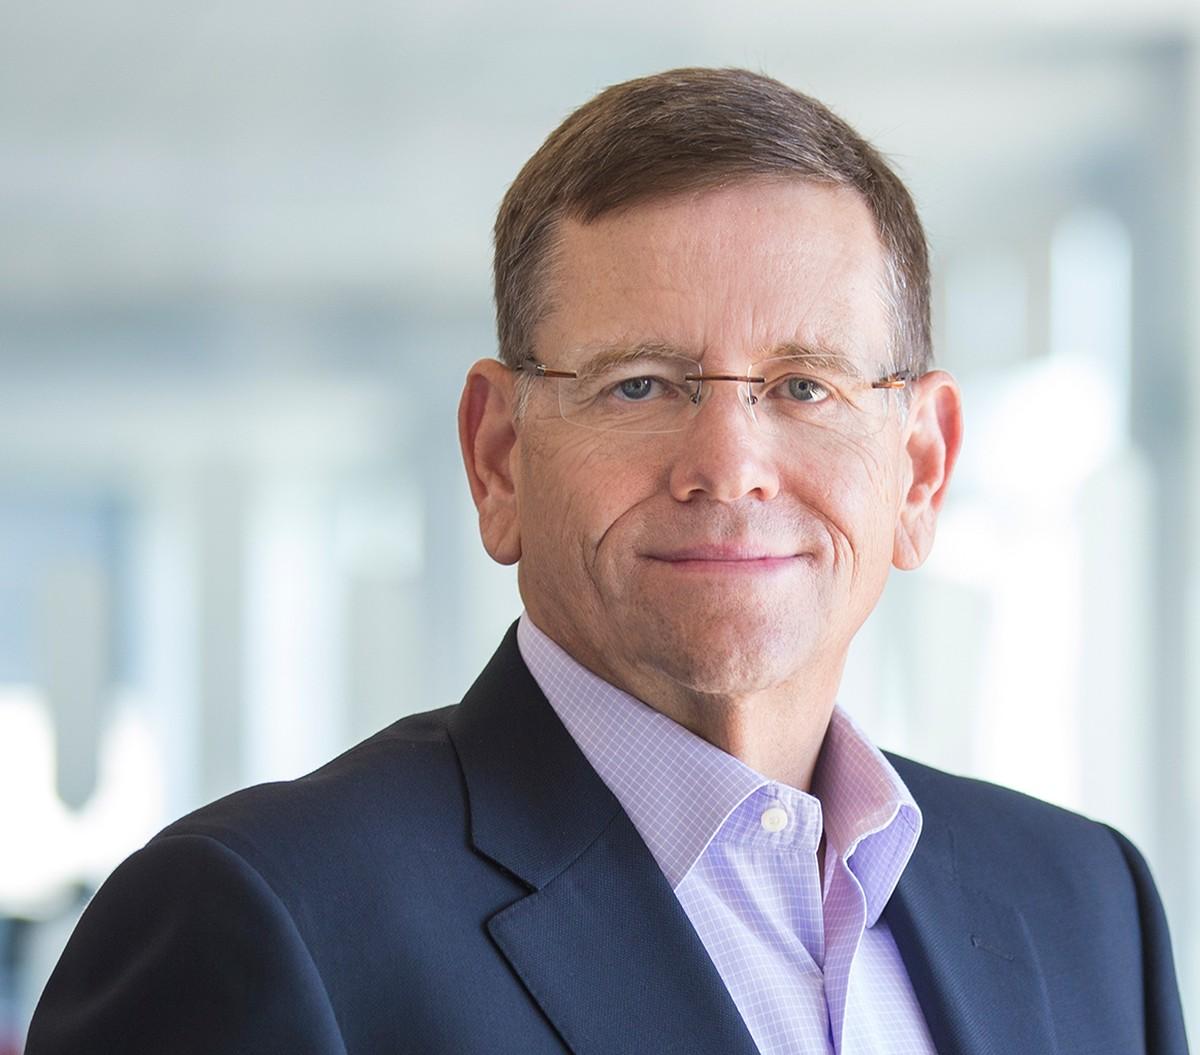 David Goeckeler CEO Western Digital